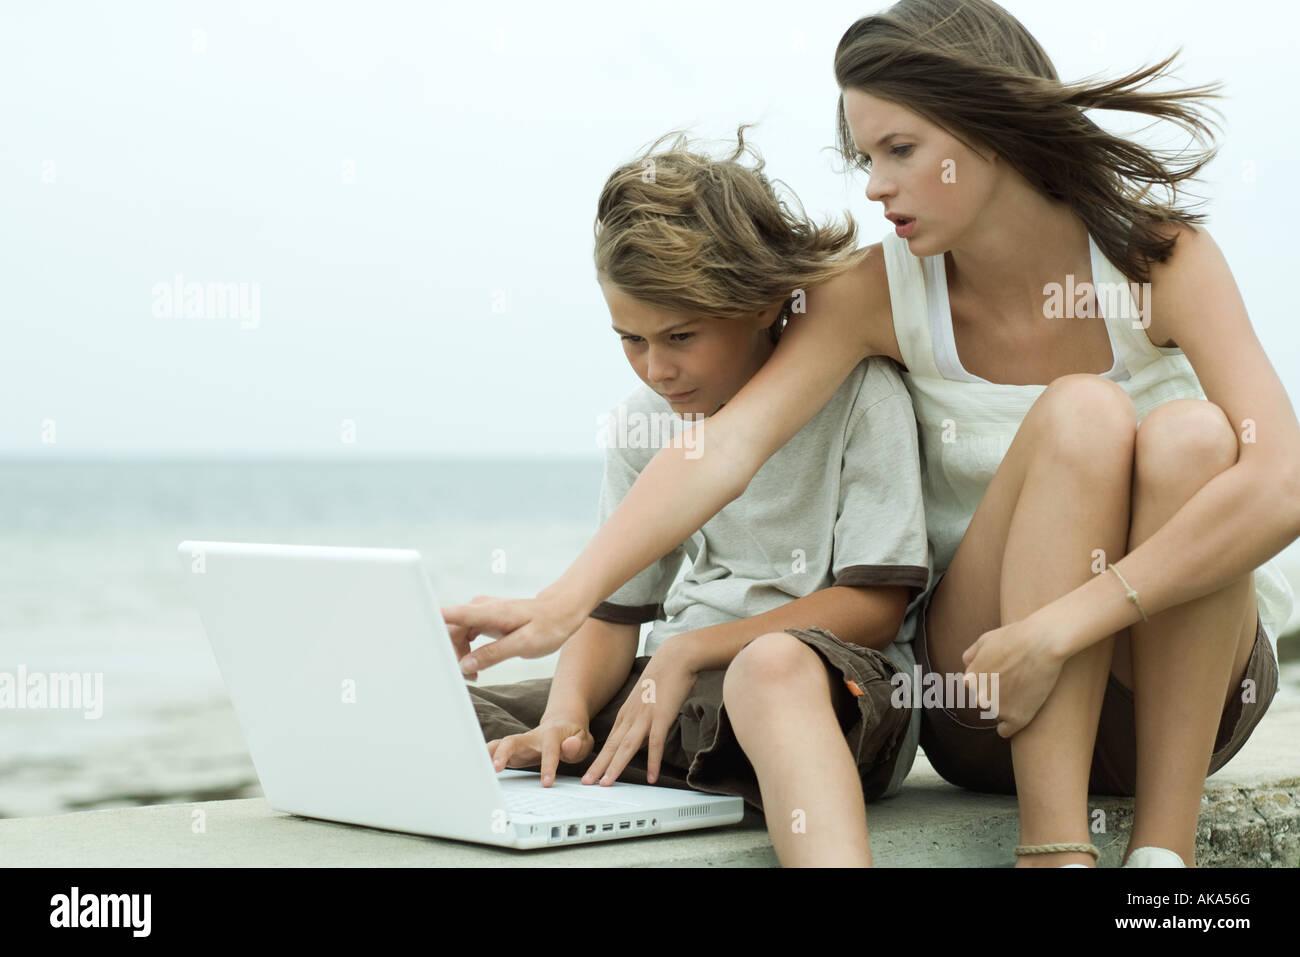 Adolescente con la sorellina Fotografie Stock Adolescente con-8744